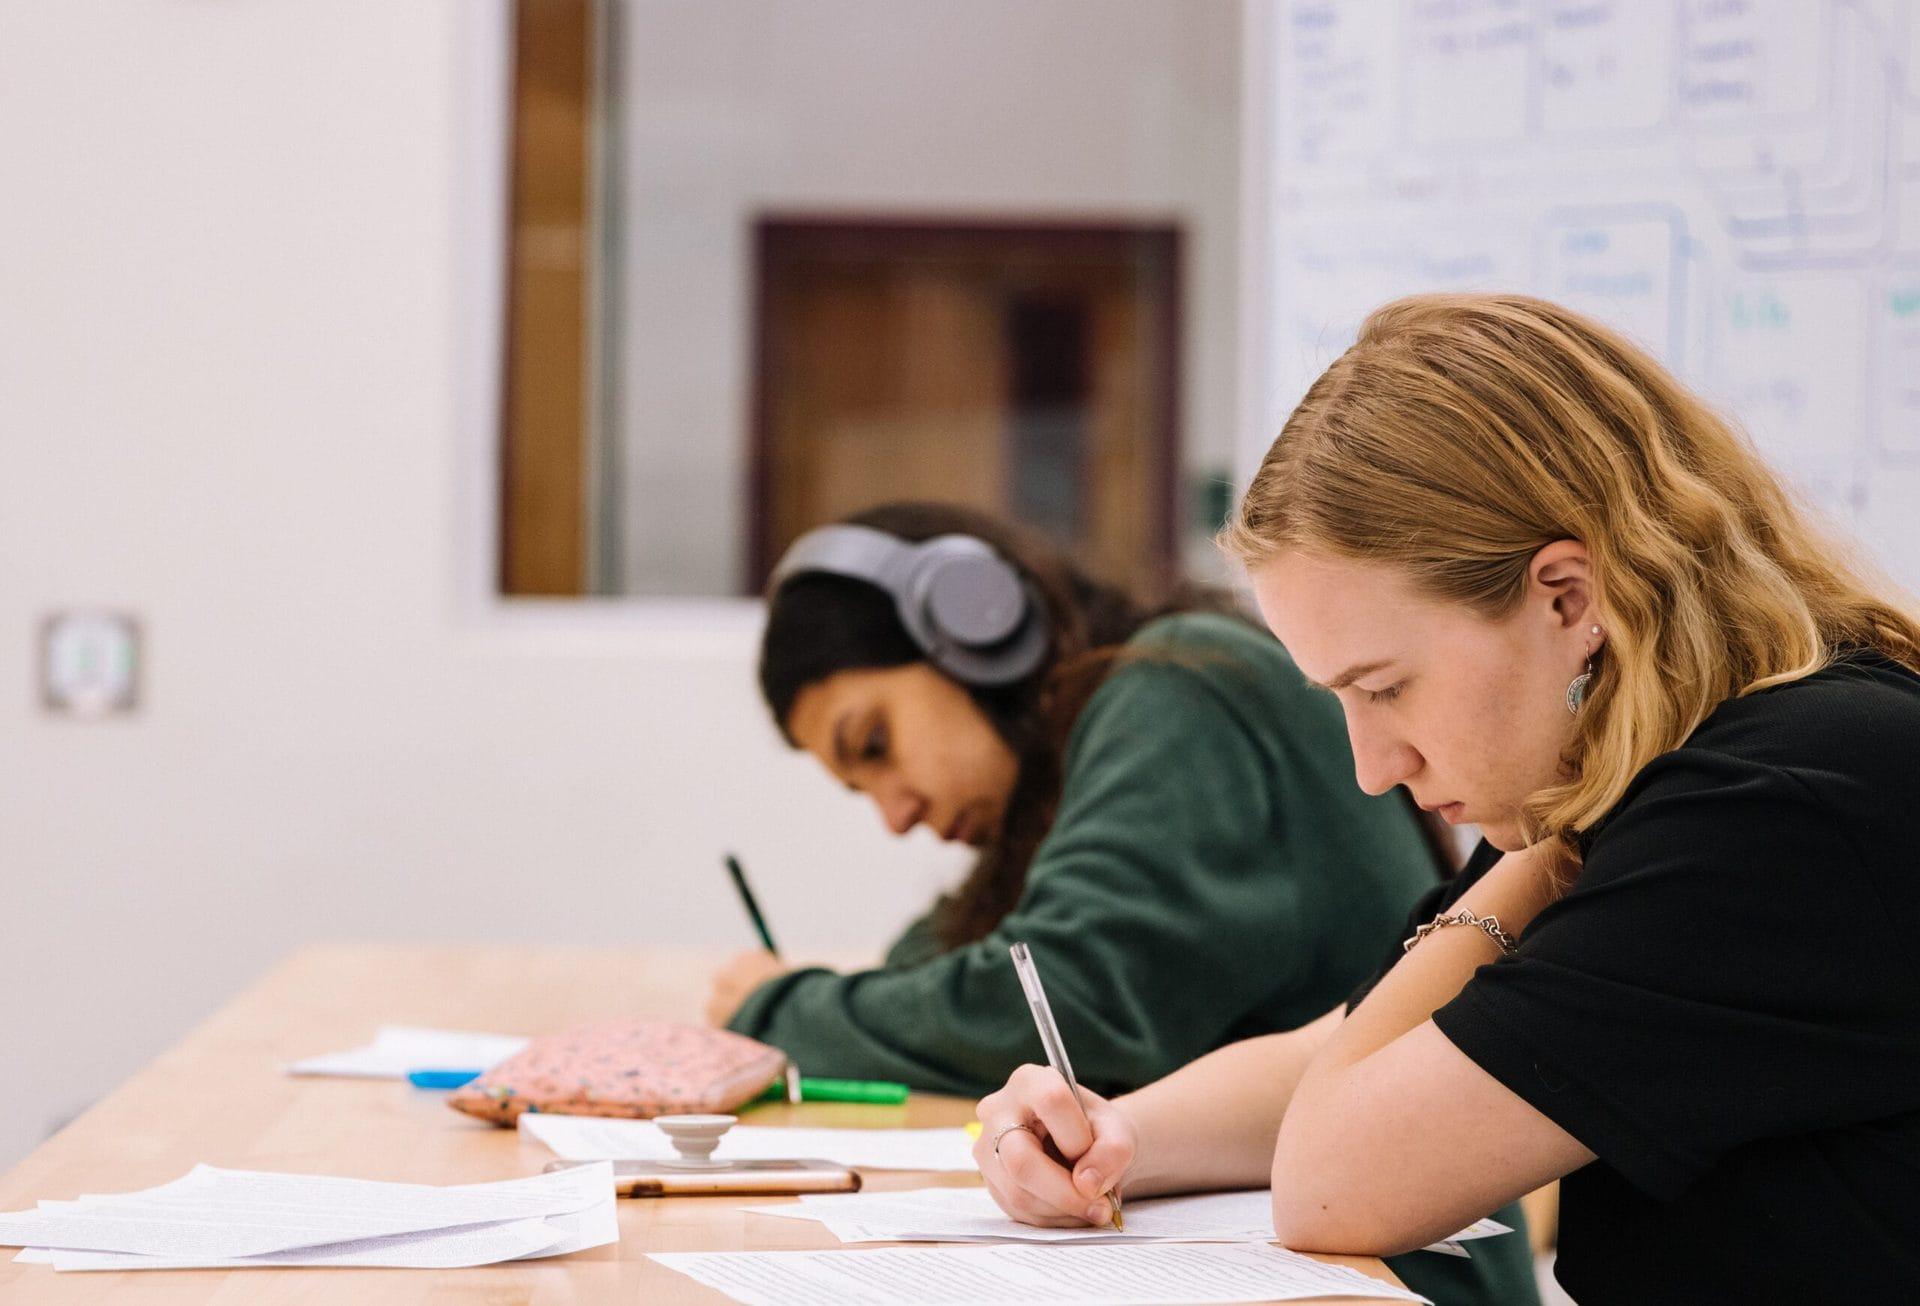 Girl in black t-shirt writing on white paper photo - Jeswin Thomas - Unsplash